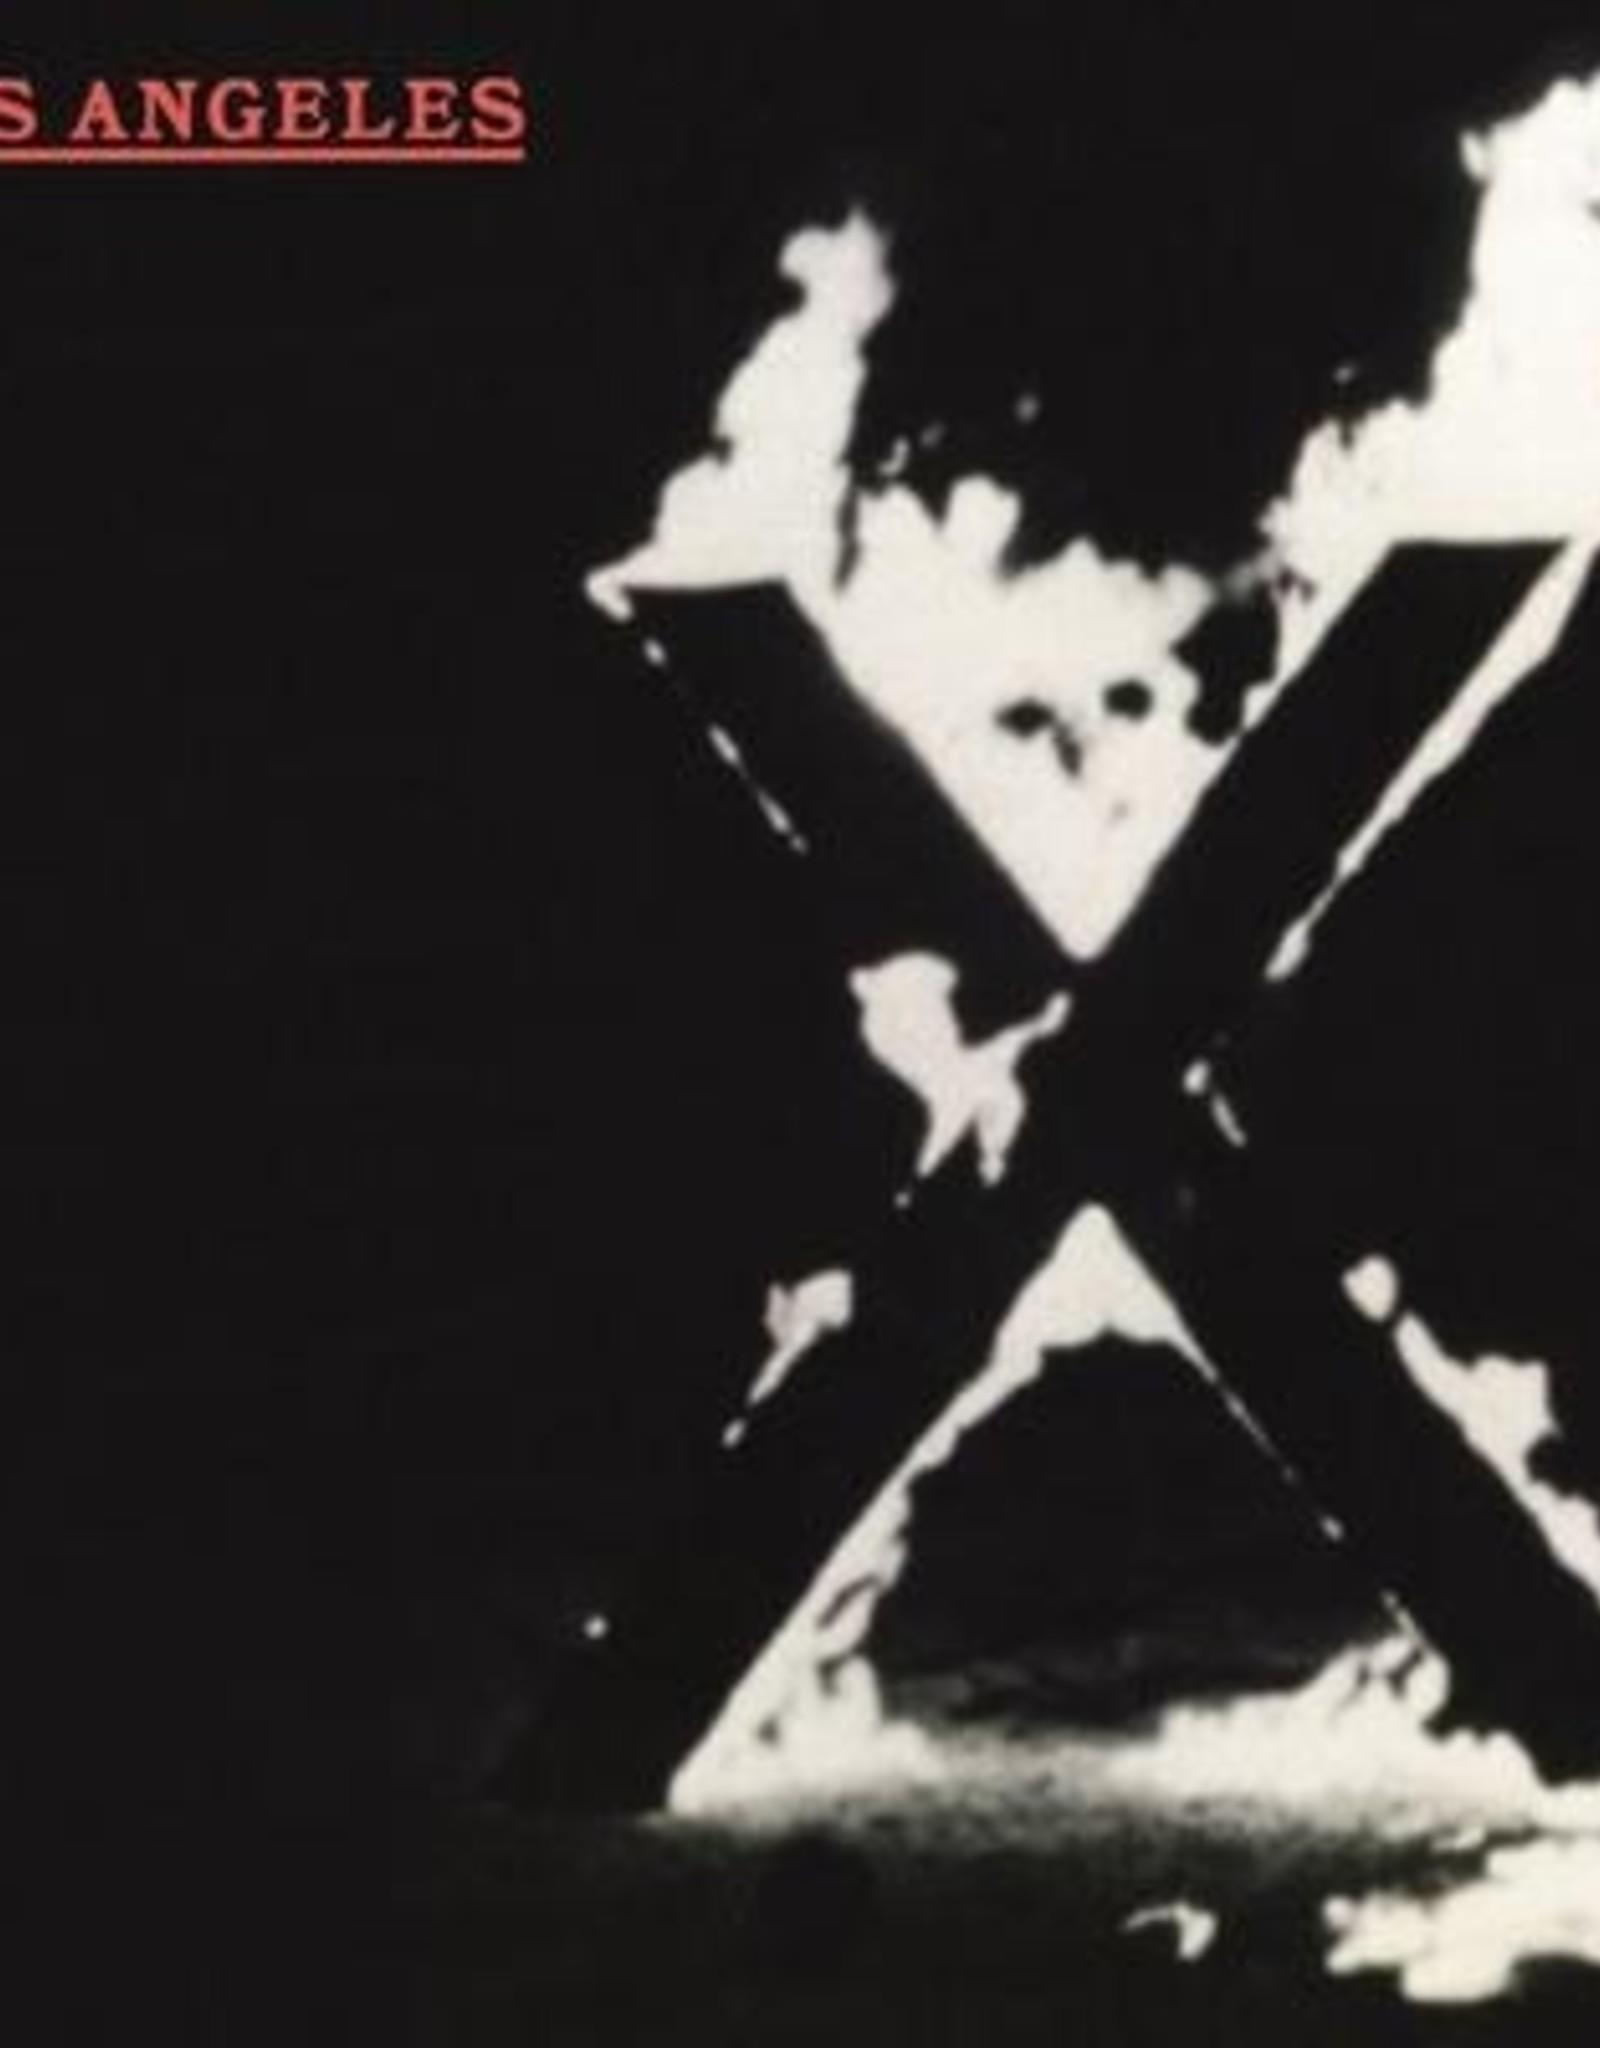 X - Los Angeles (Vinyl)